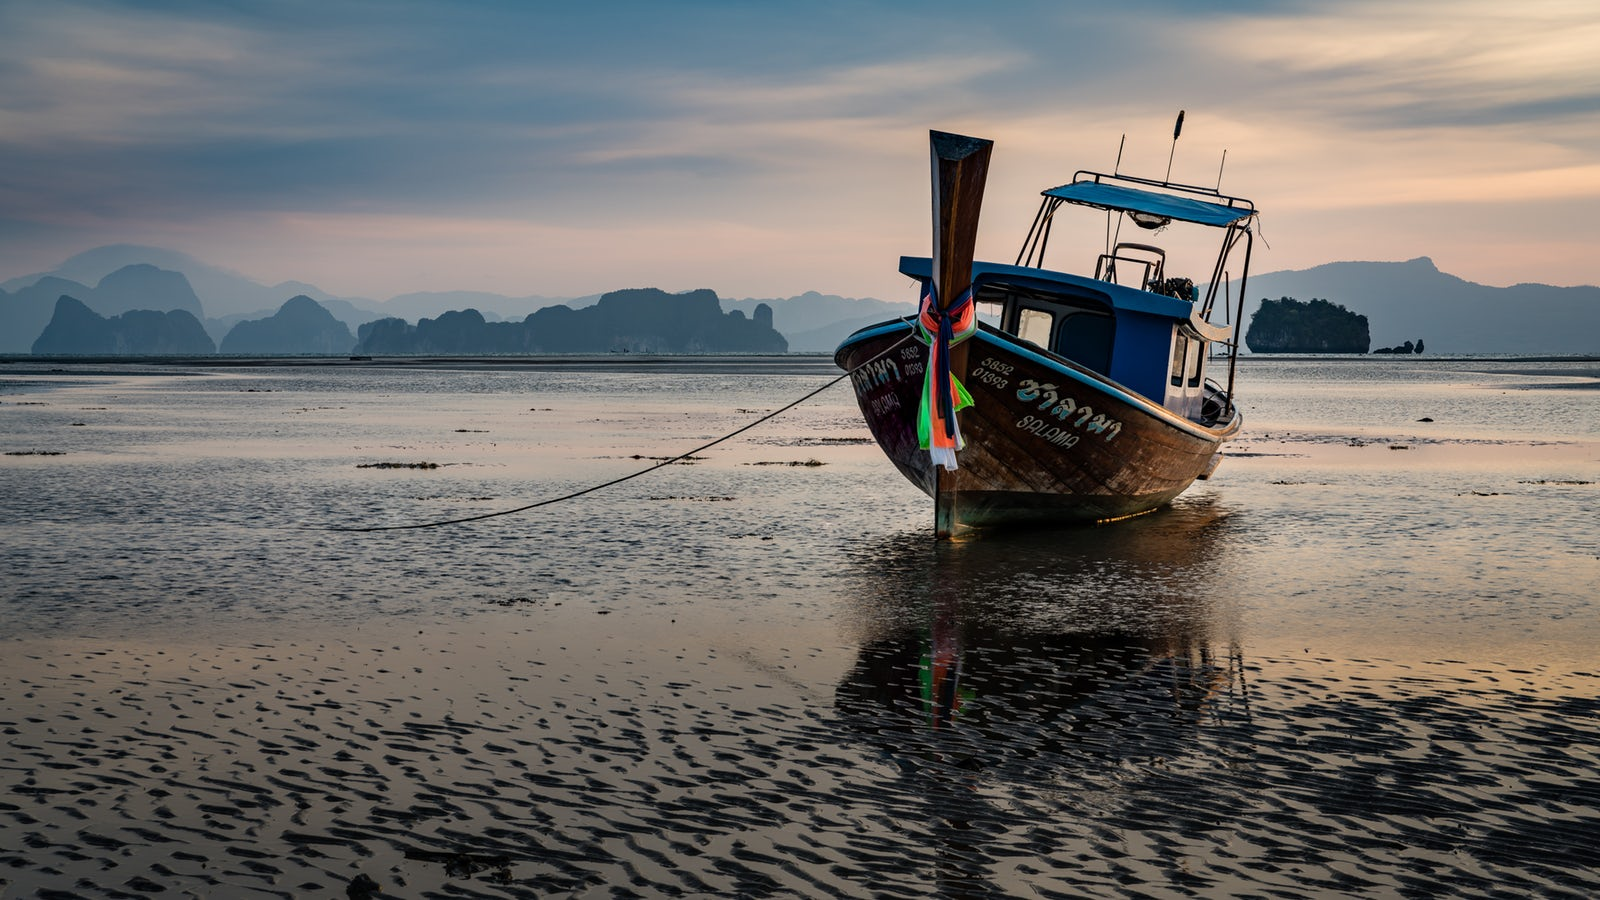 Longtail boat, Koh Yao Yai